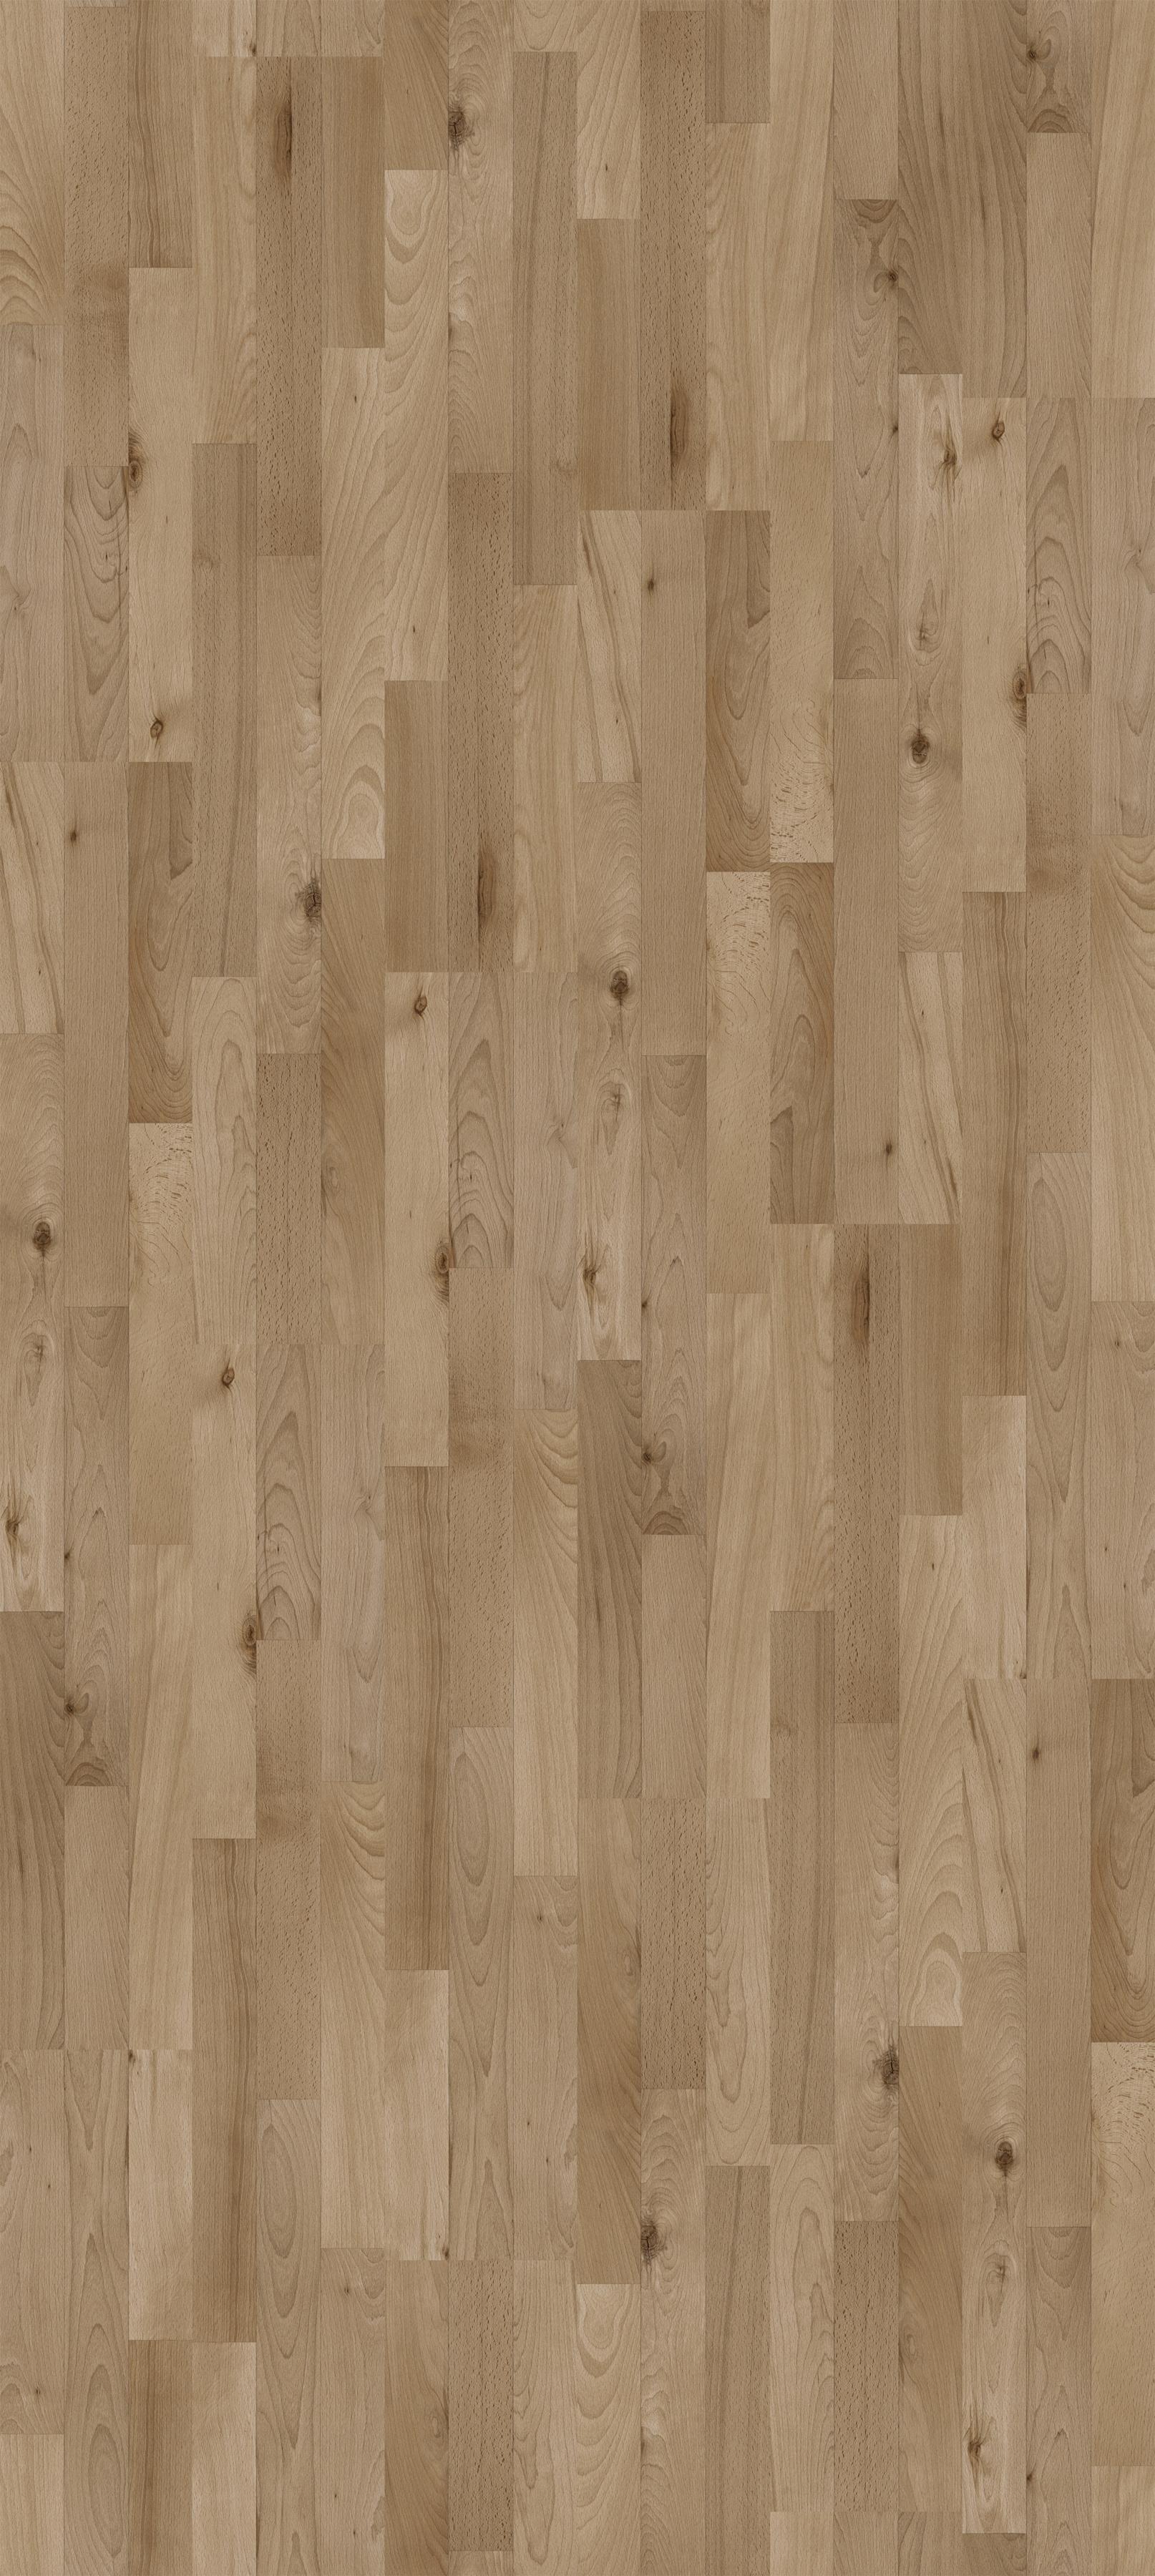 laminat click 39 in buche ged mpft seidenmatte struktur. Black Bedroom Furniture Sets. Home Design Ideas